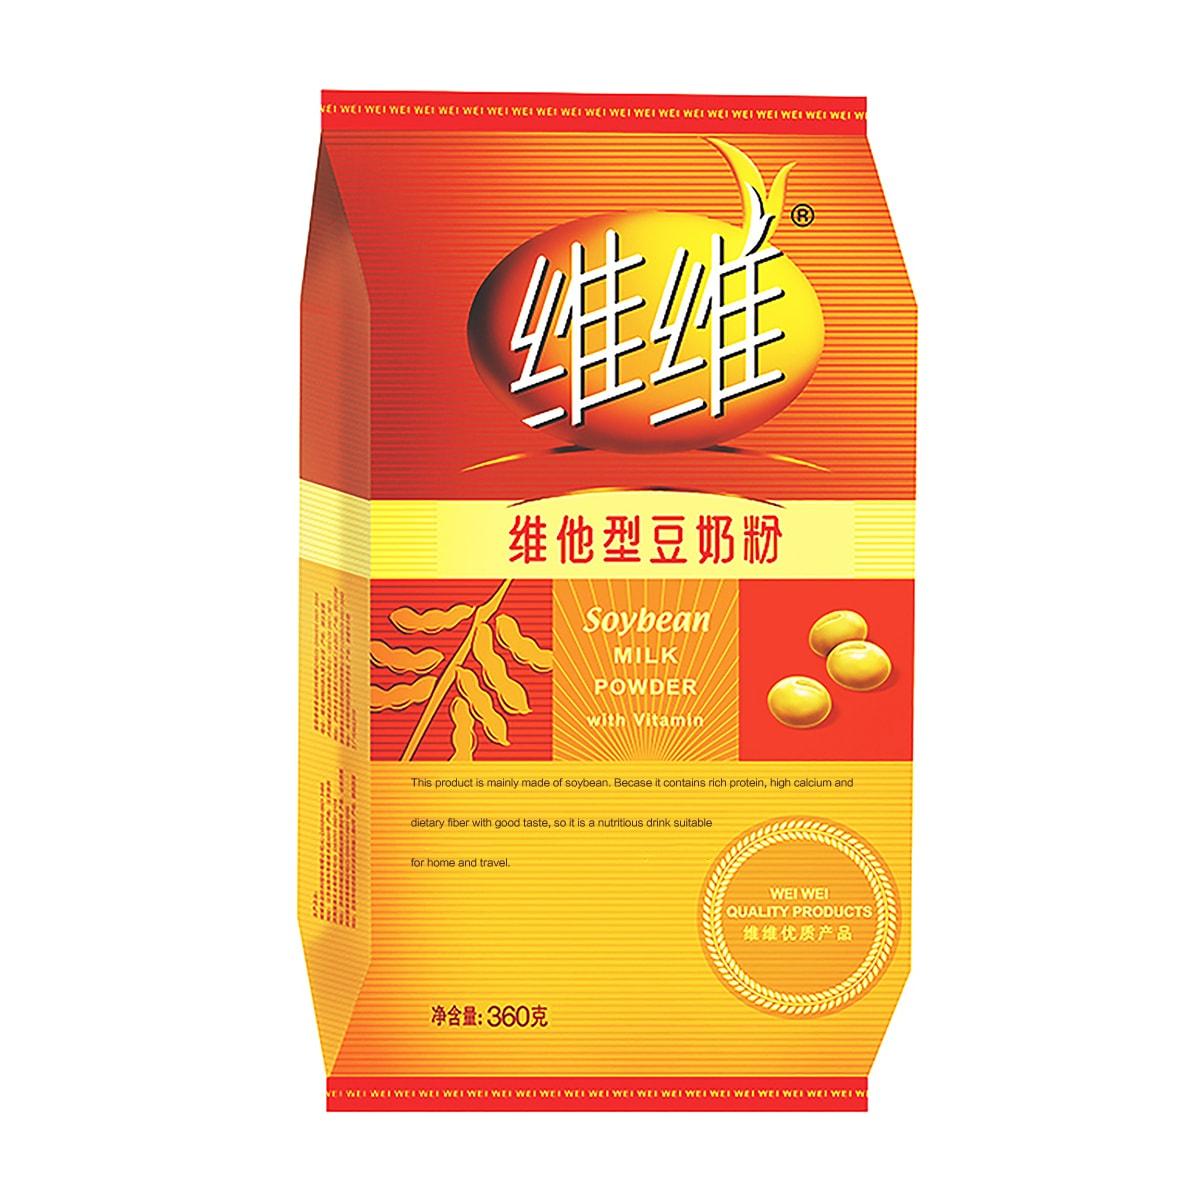 WEIWEI Soybean Milk Powder (Vitamin) 360g